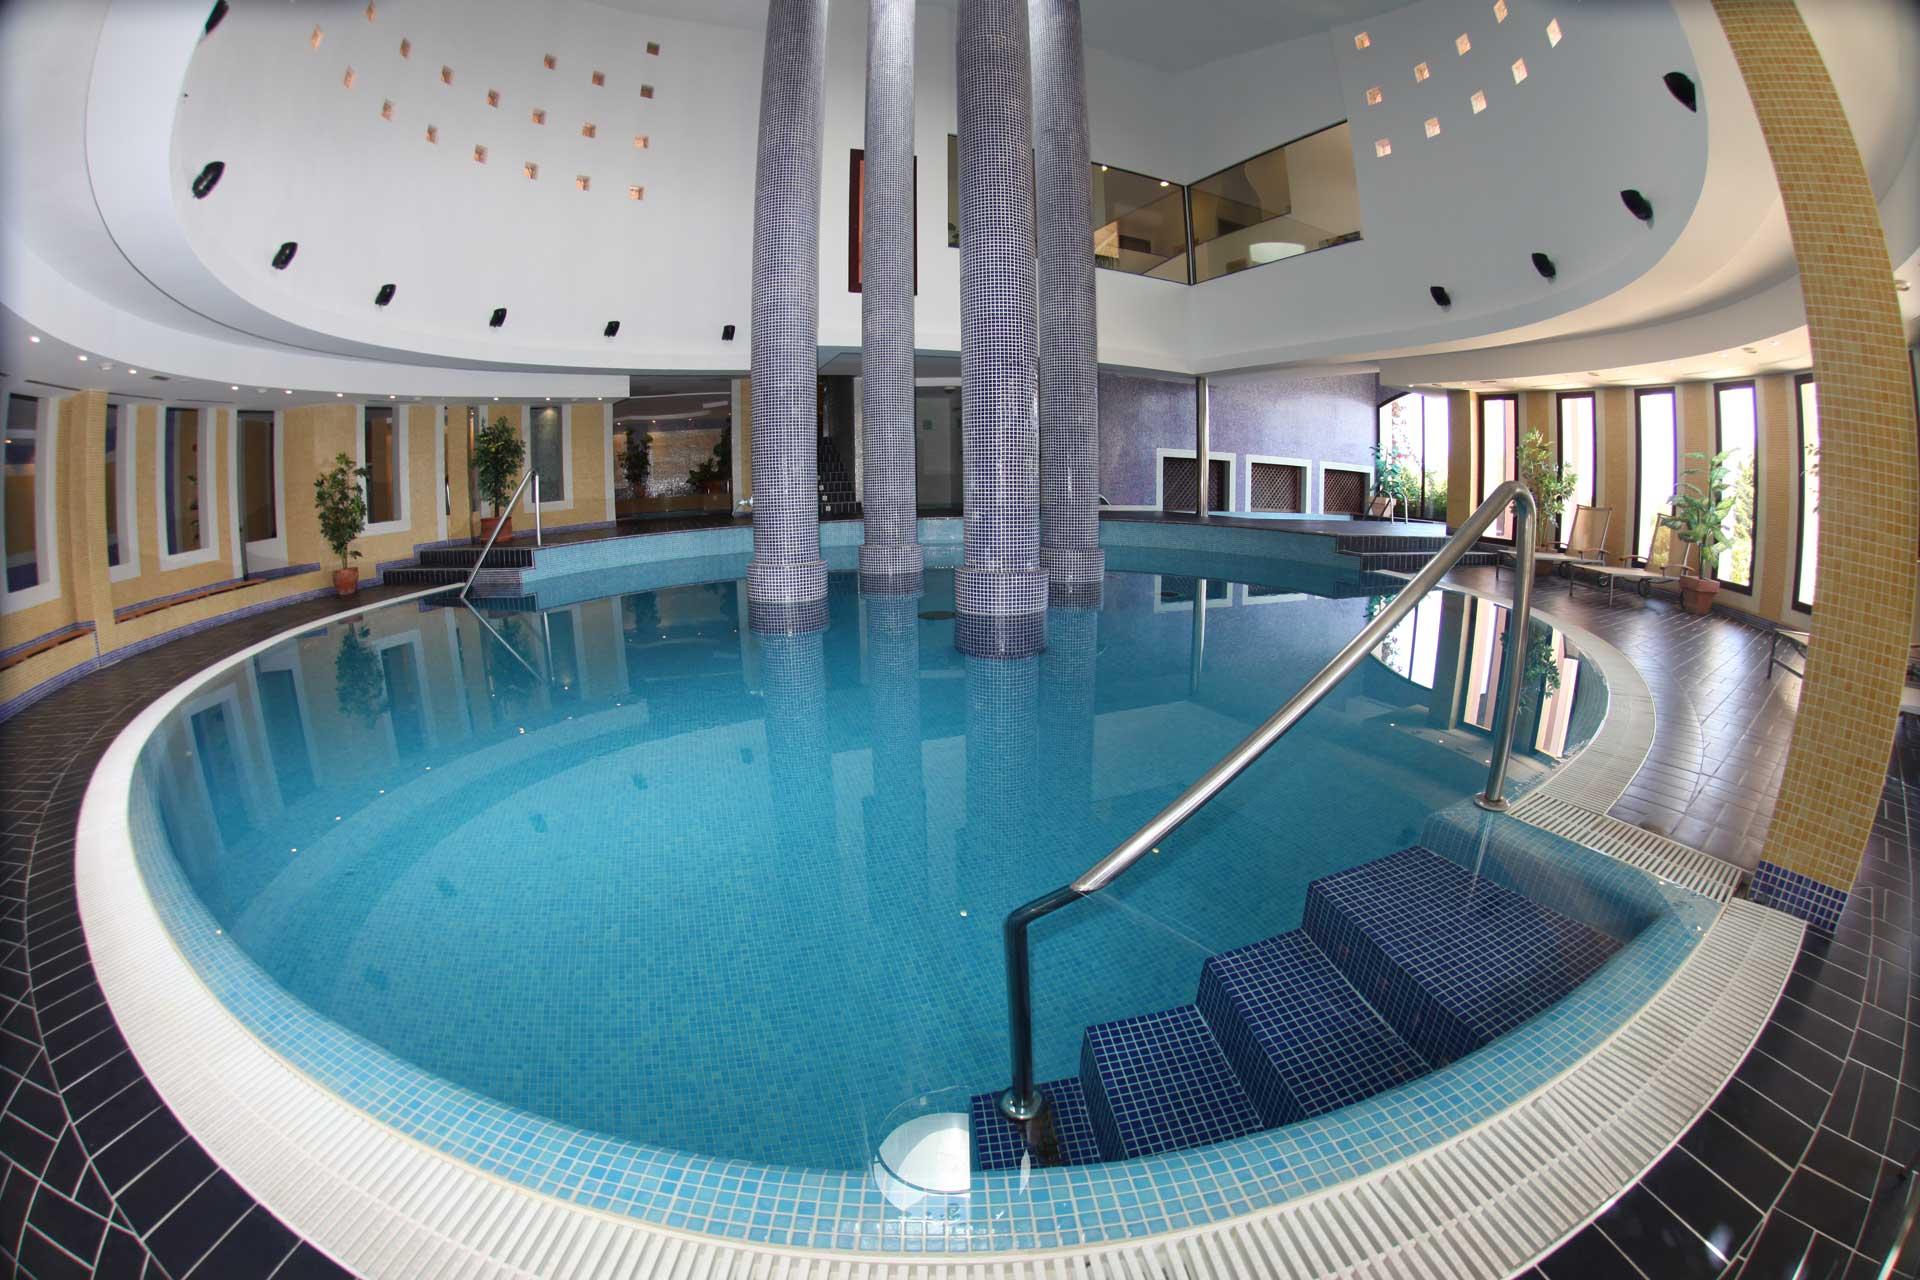 Finca-Hotel Sentido Pula Suites - Spa & Wellness